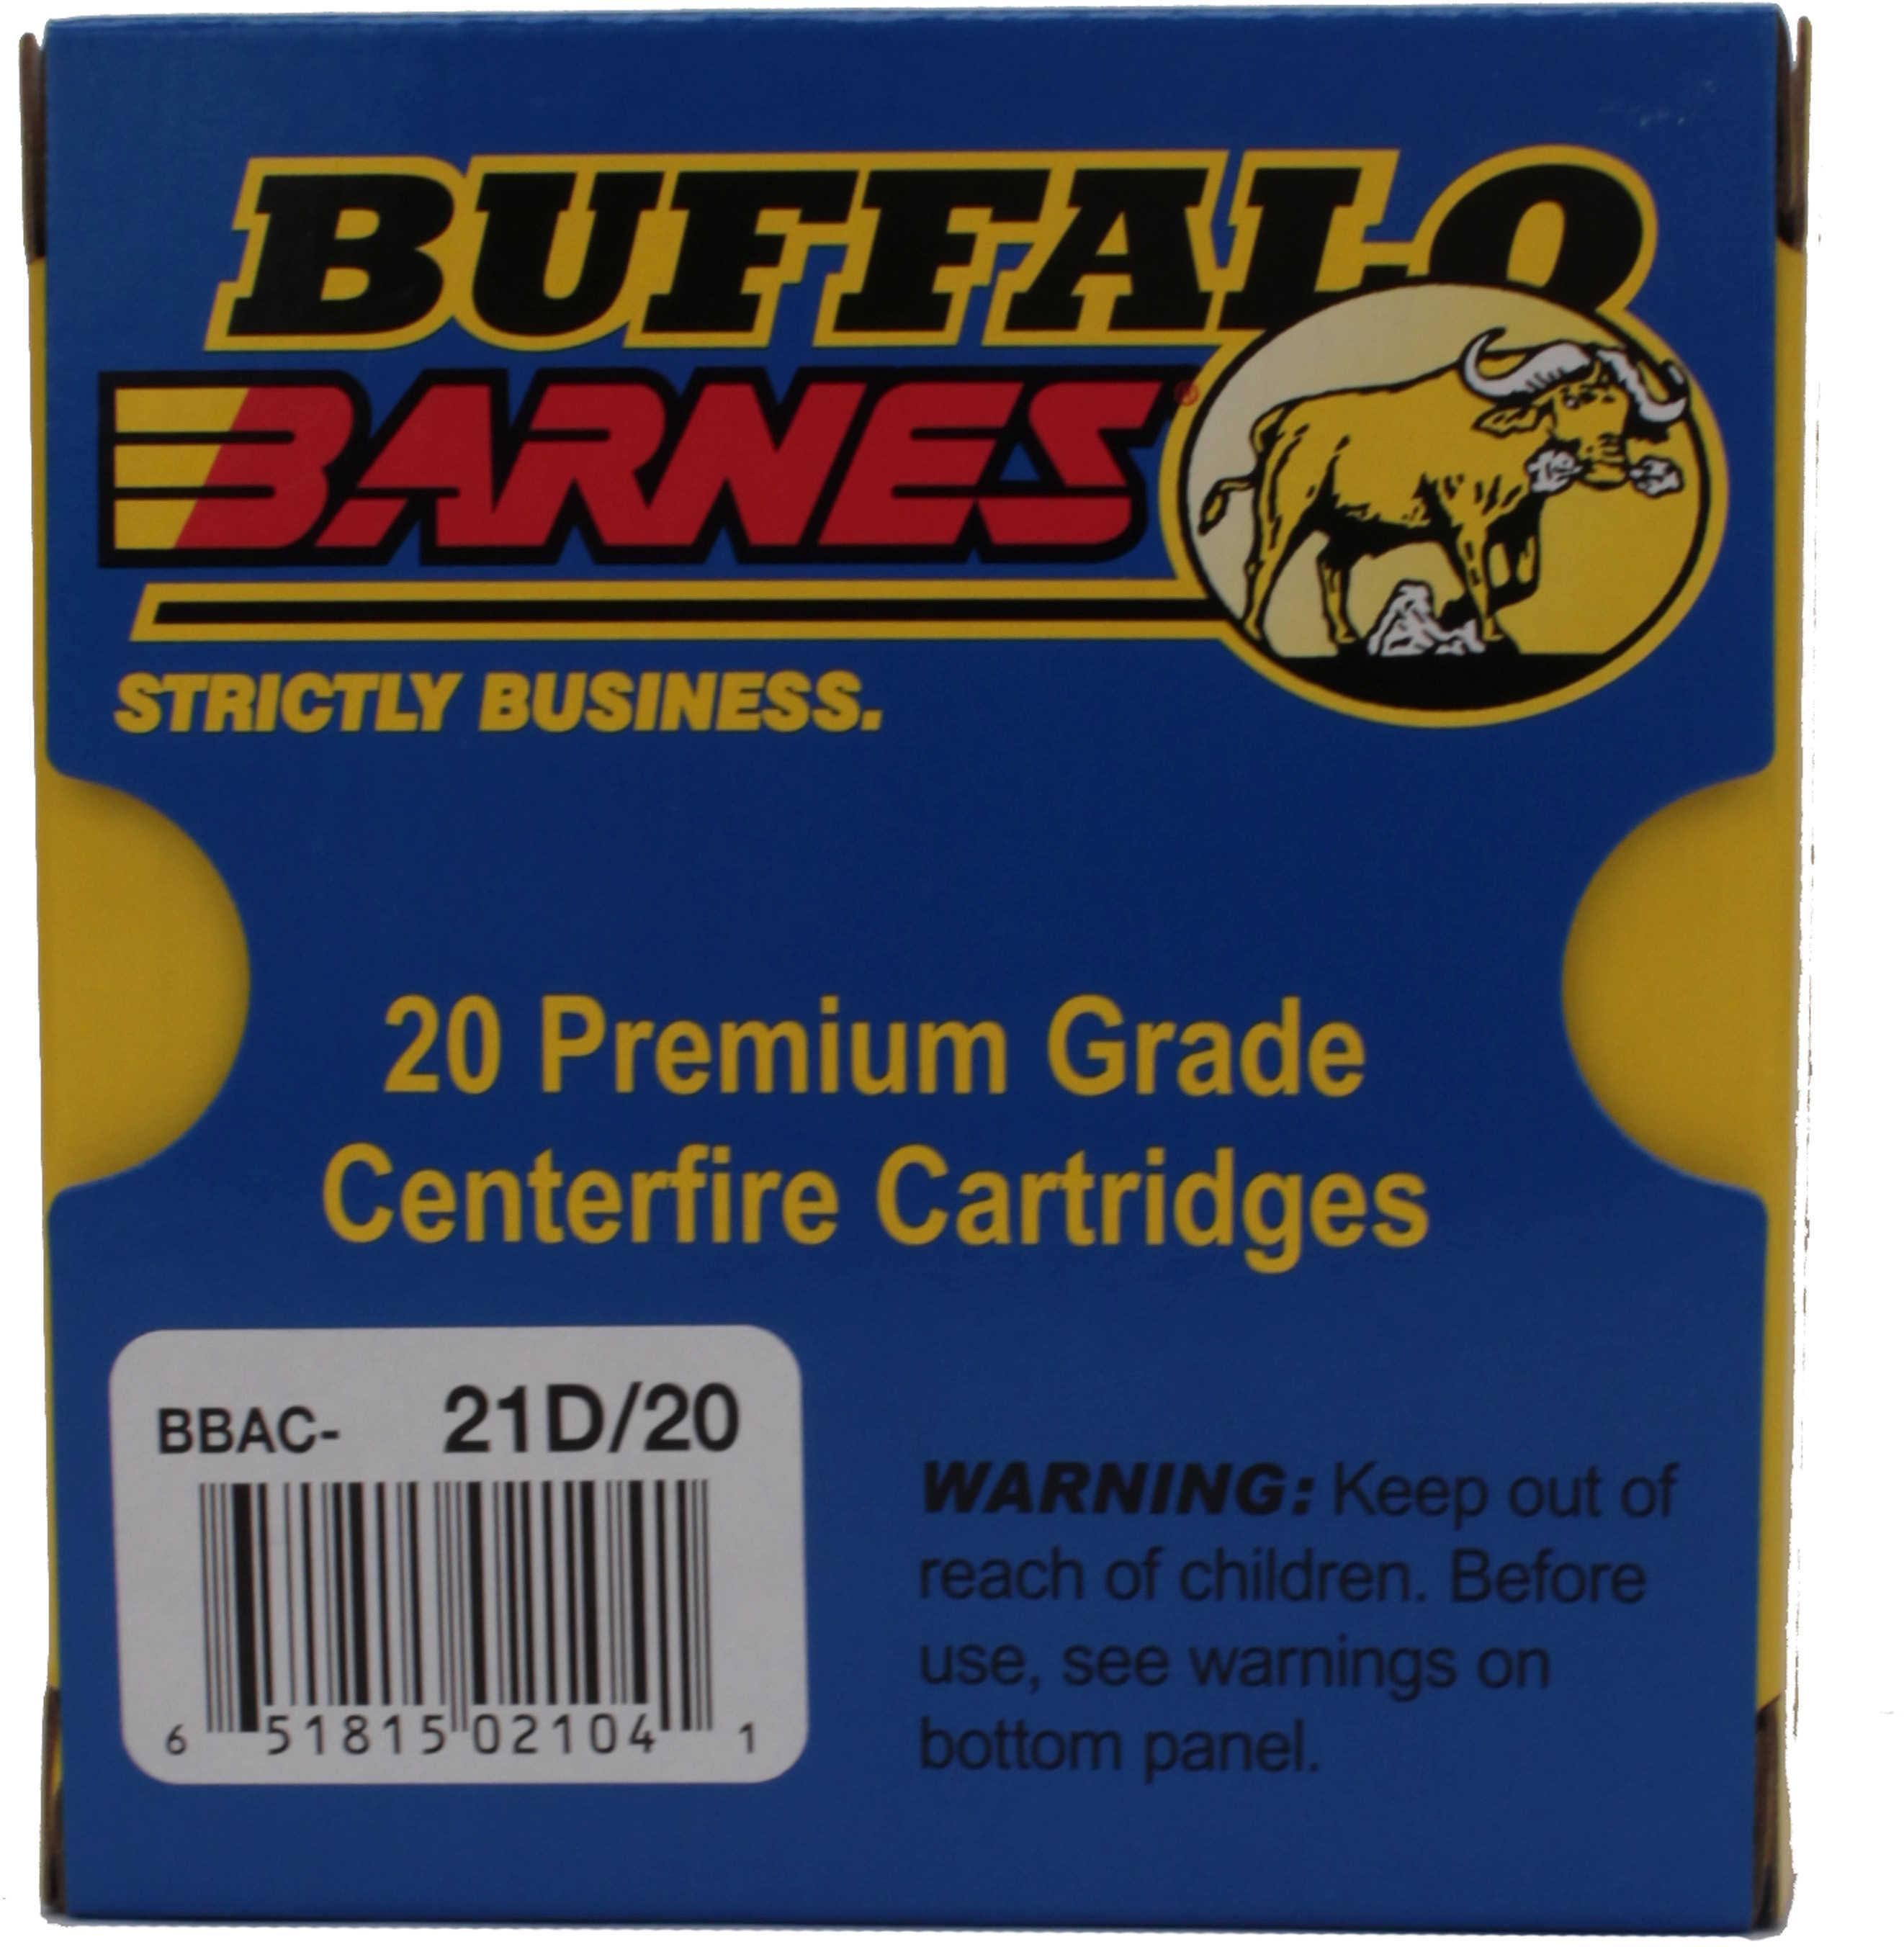 Buffalo Bore Ammunition 21D/20 Buffalo-Barnes Lead-Free 10mm Auto 155 GR Barnes TAC-XP 20 Bx/ 12 Cs